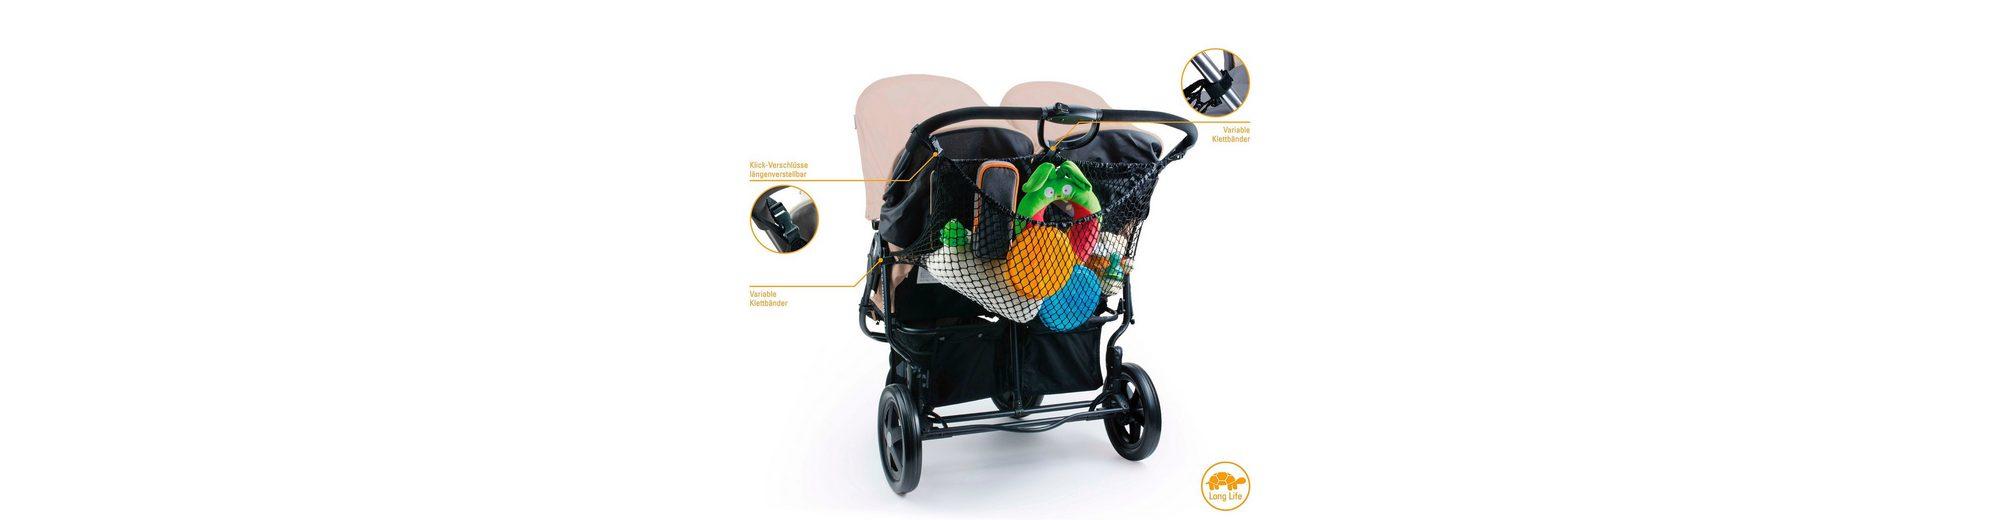 DIAGO XL Einkaufsnetz